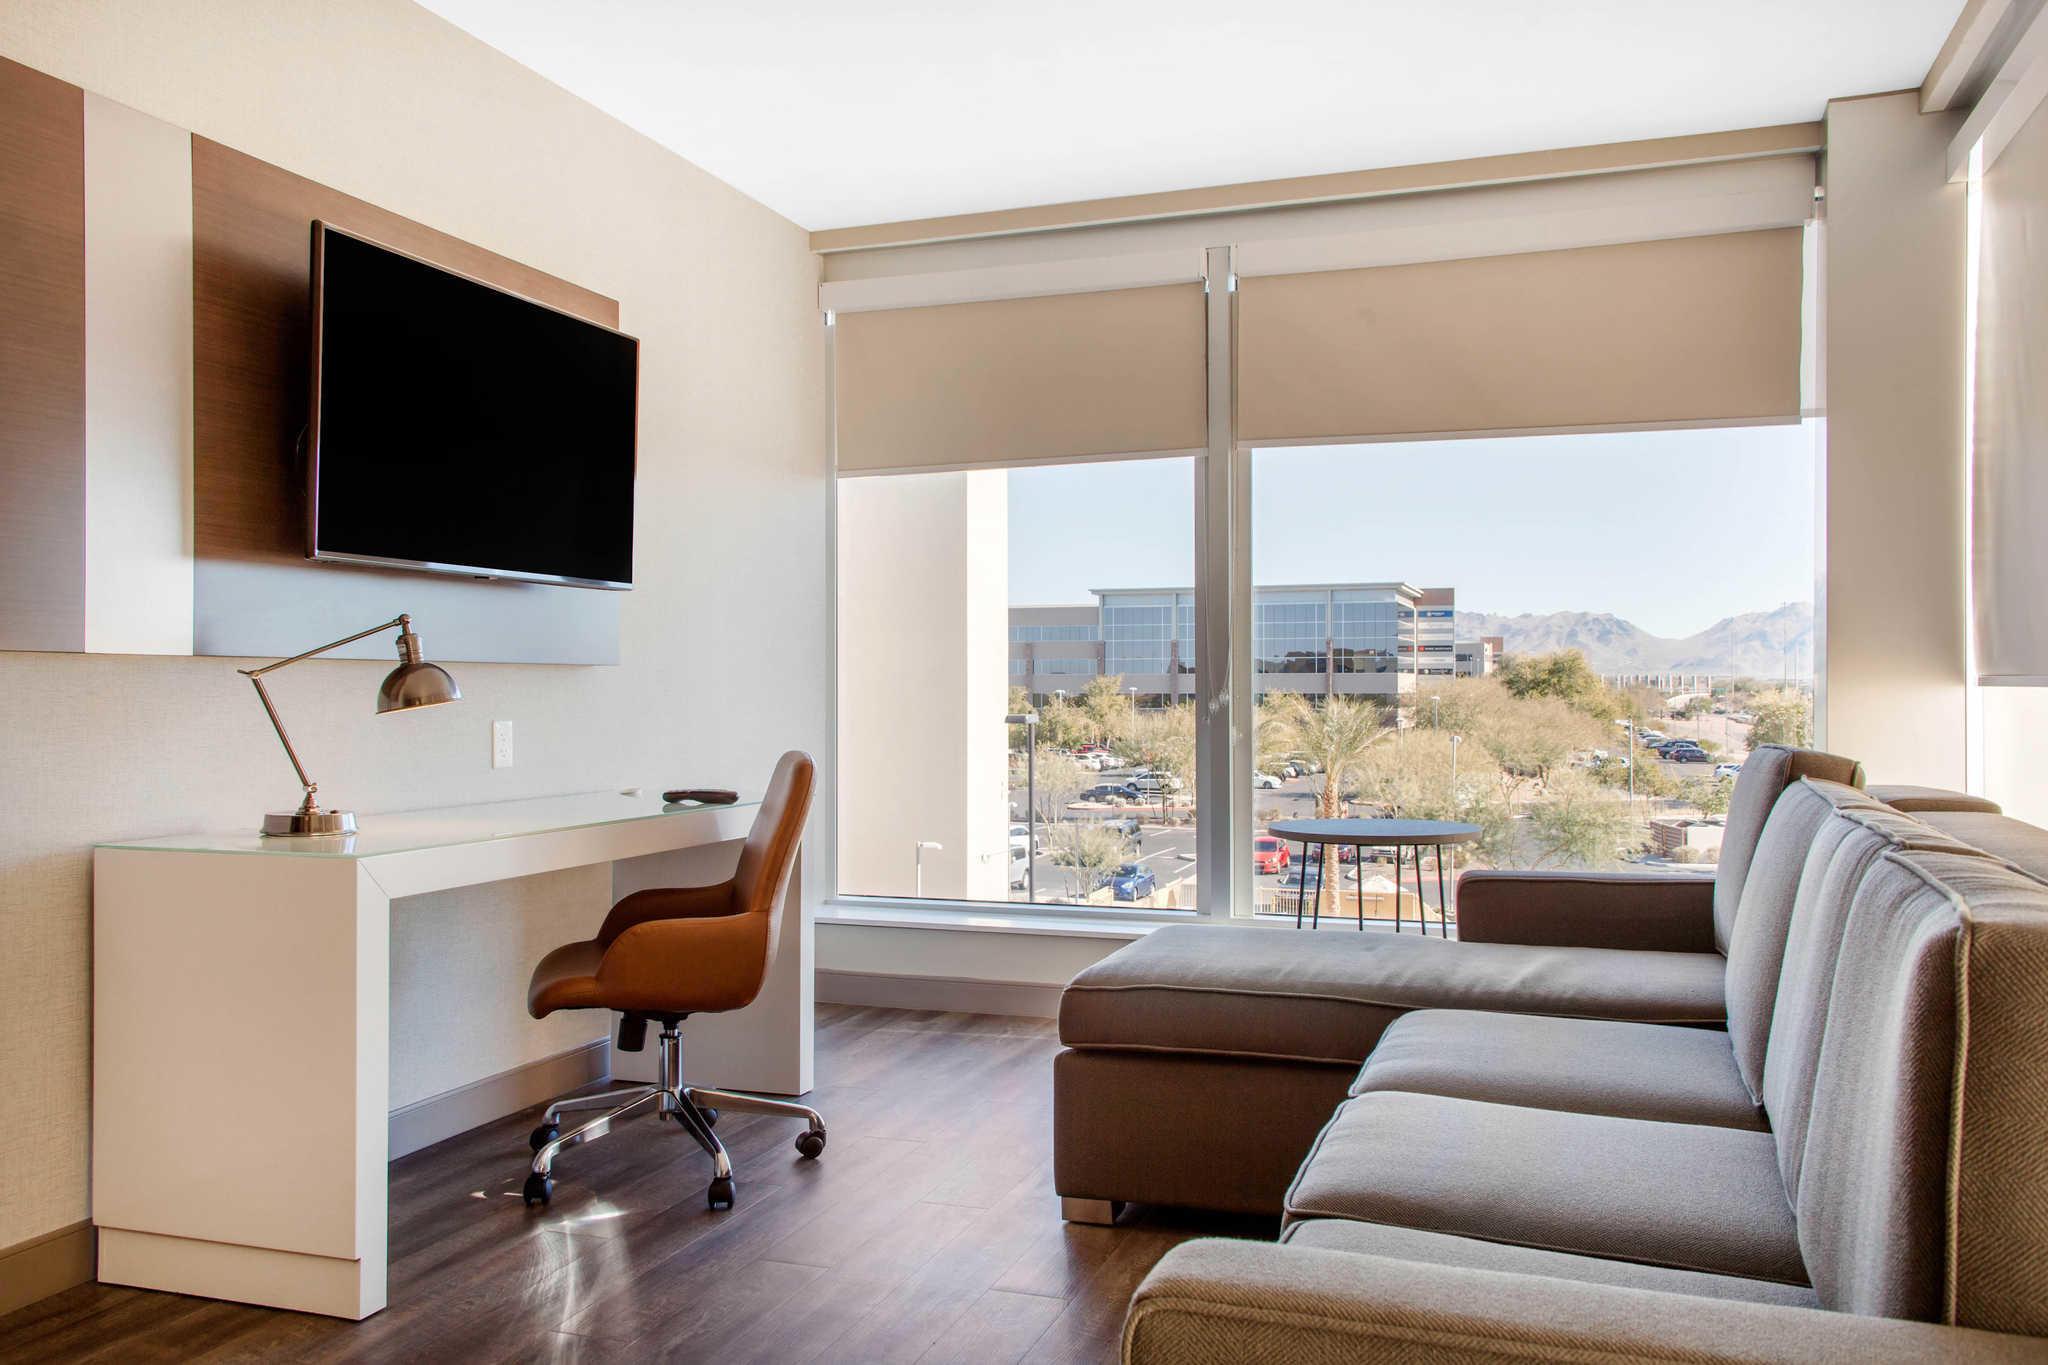 Cambria Hotel North Scottsdale Desert Ridge image 18